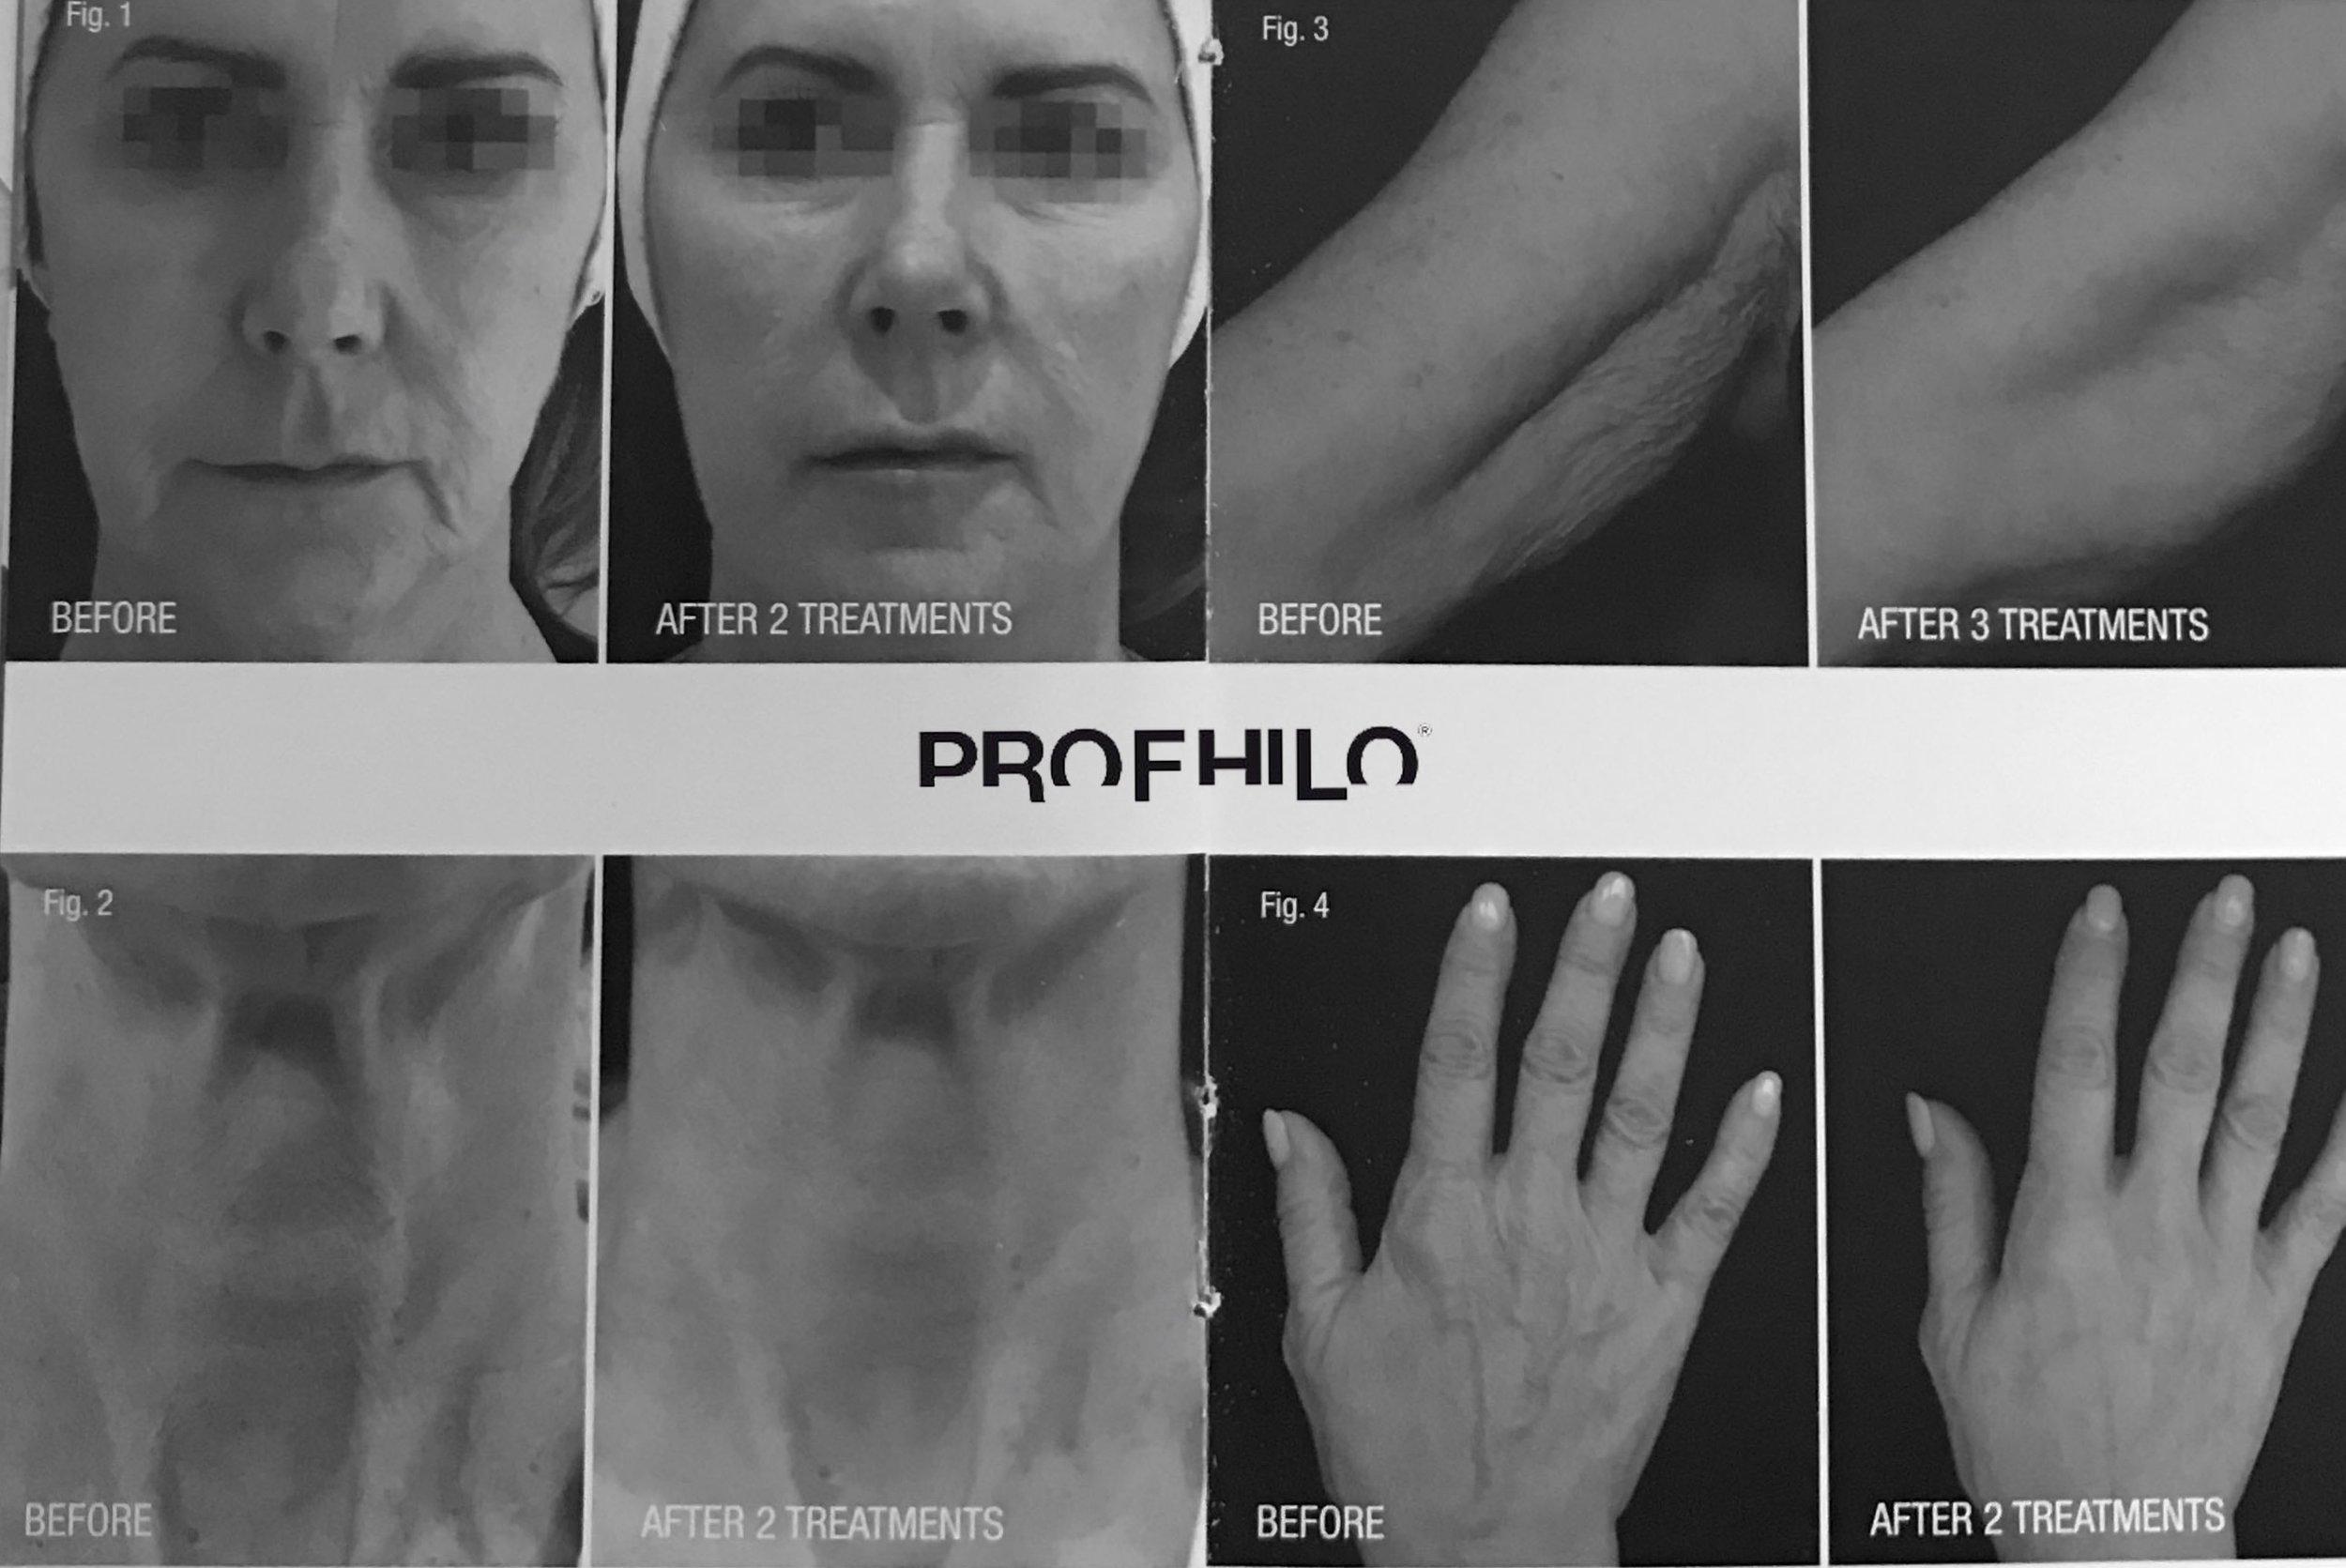 profhilo results final.jpg